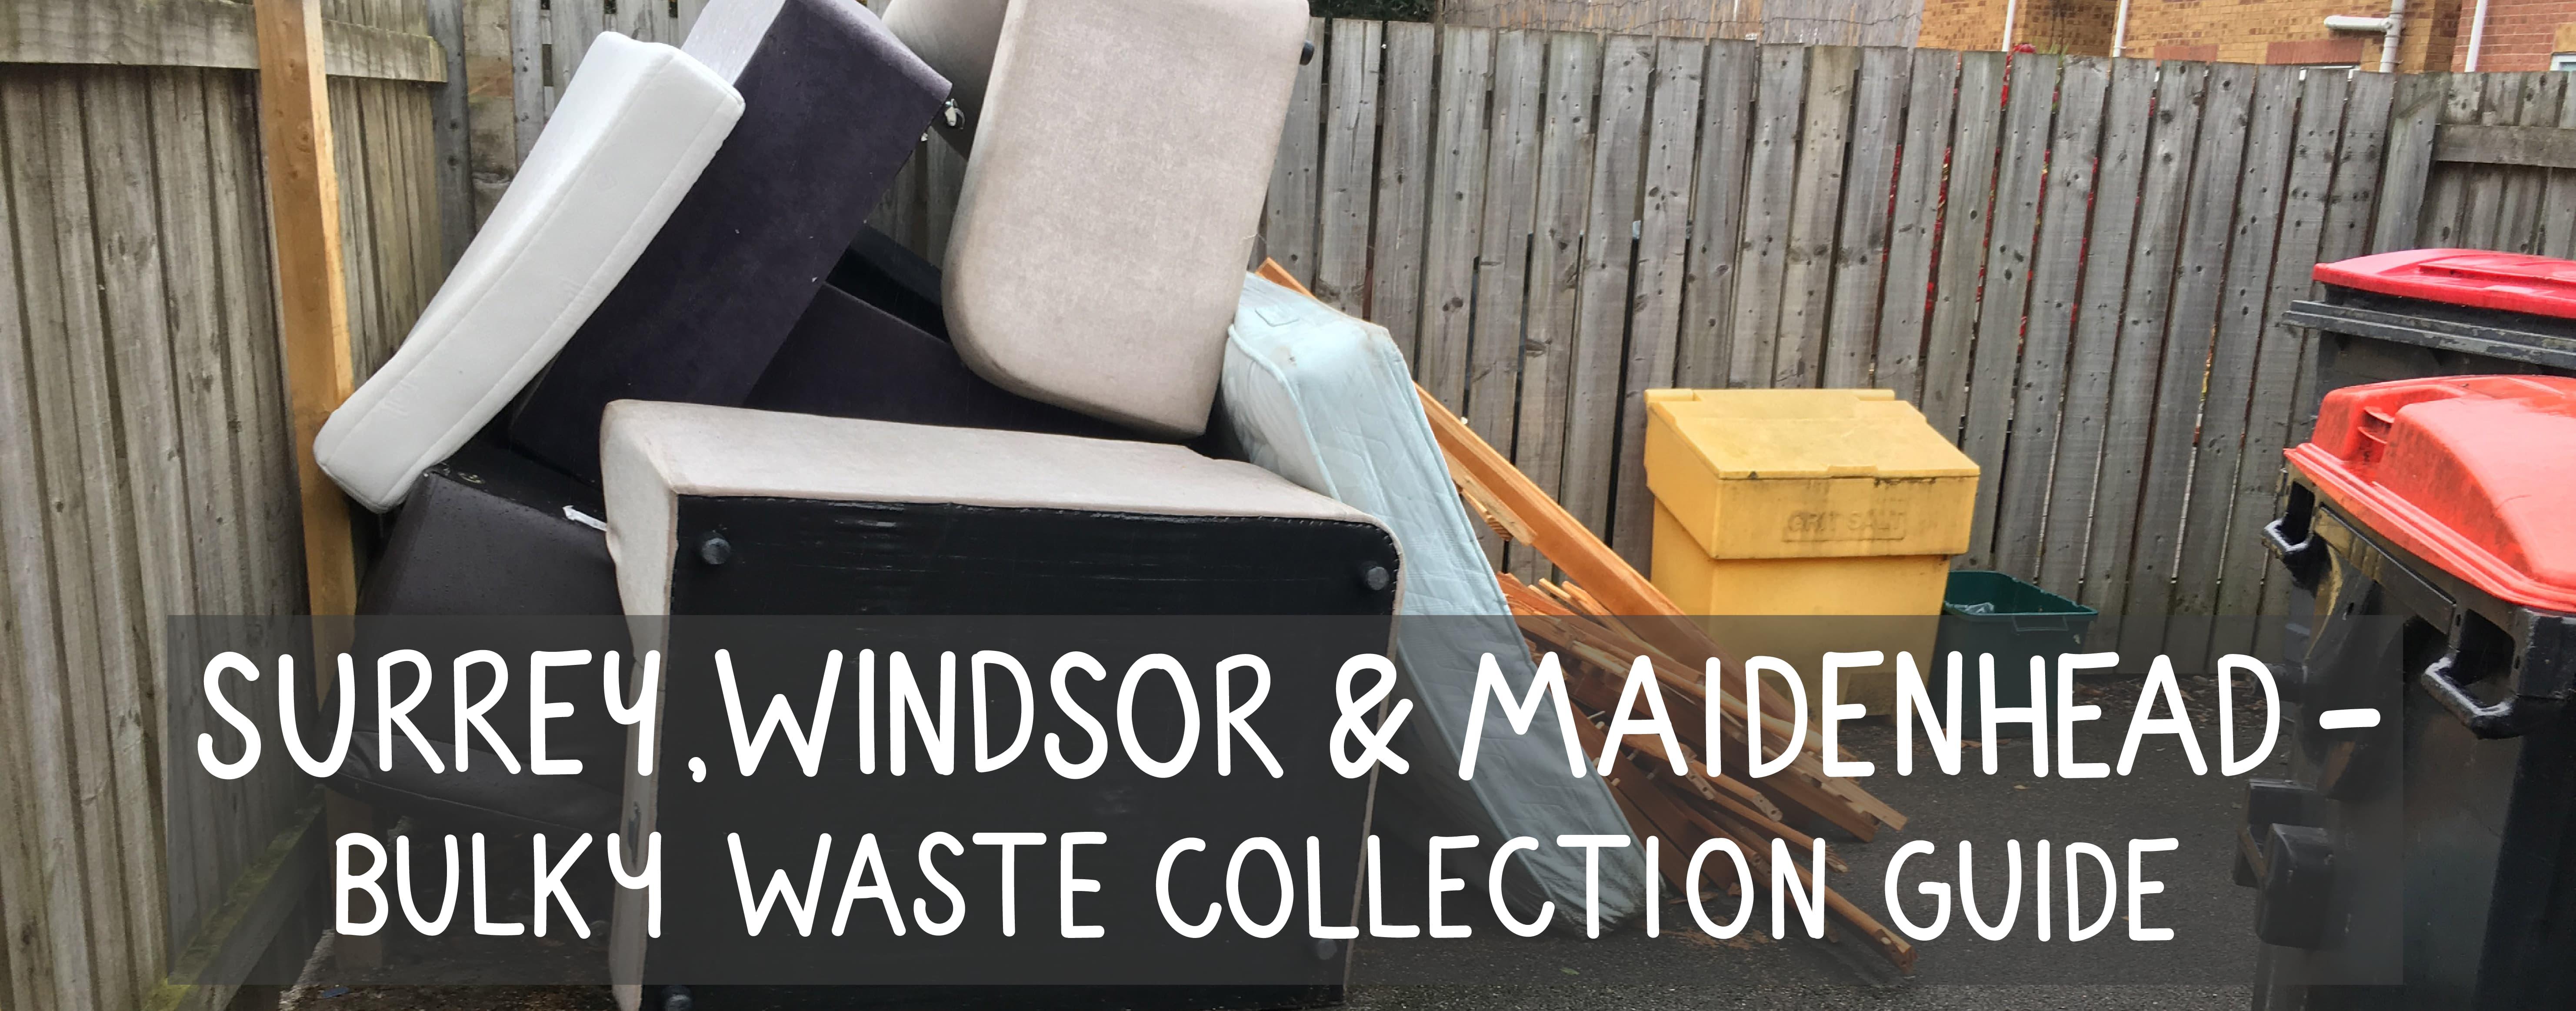 Bulky waste surrey maidenhead & windsor